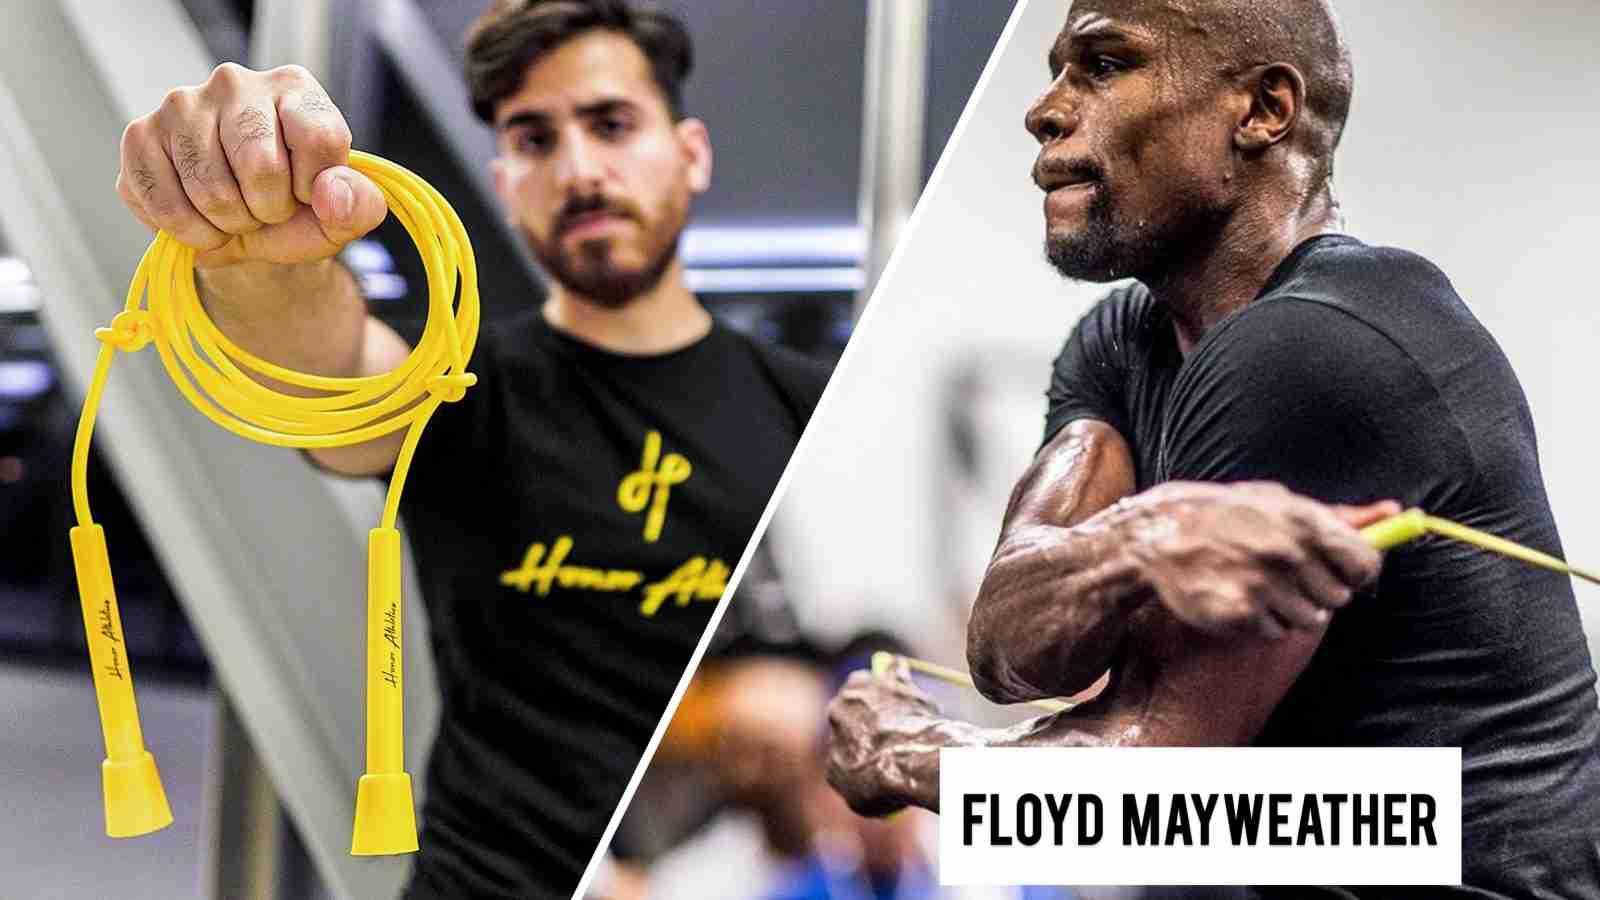 Floyd Mayweather Jump Rope